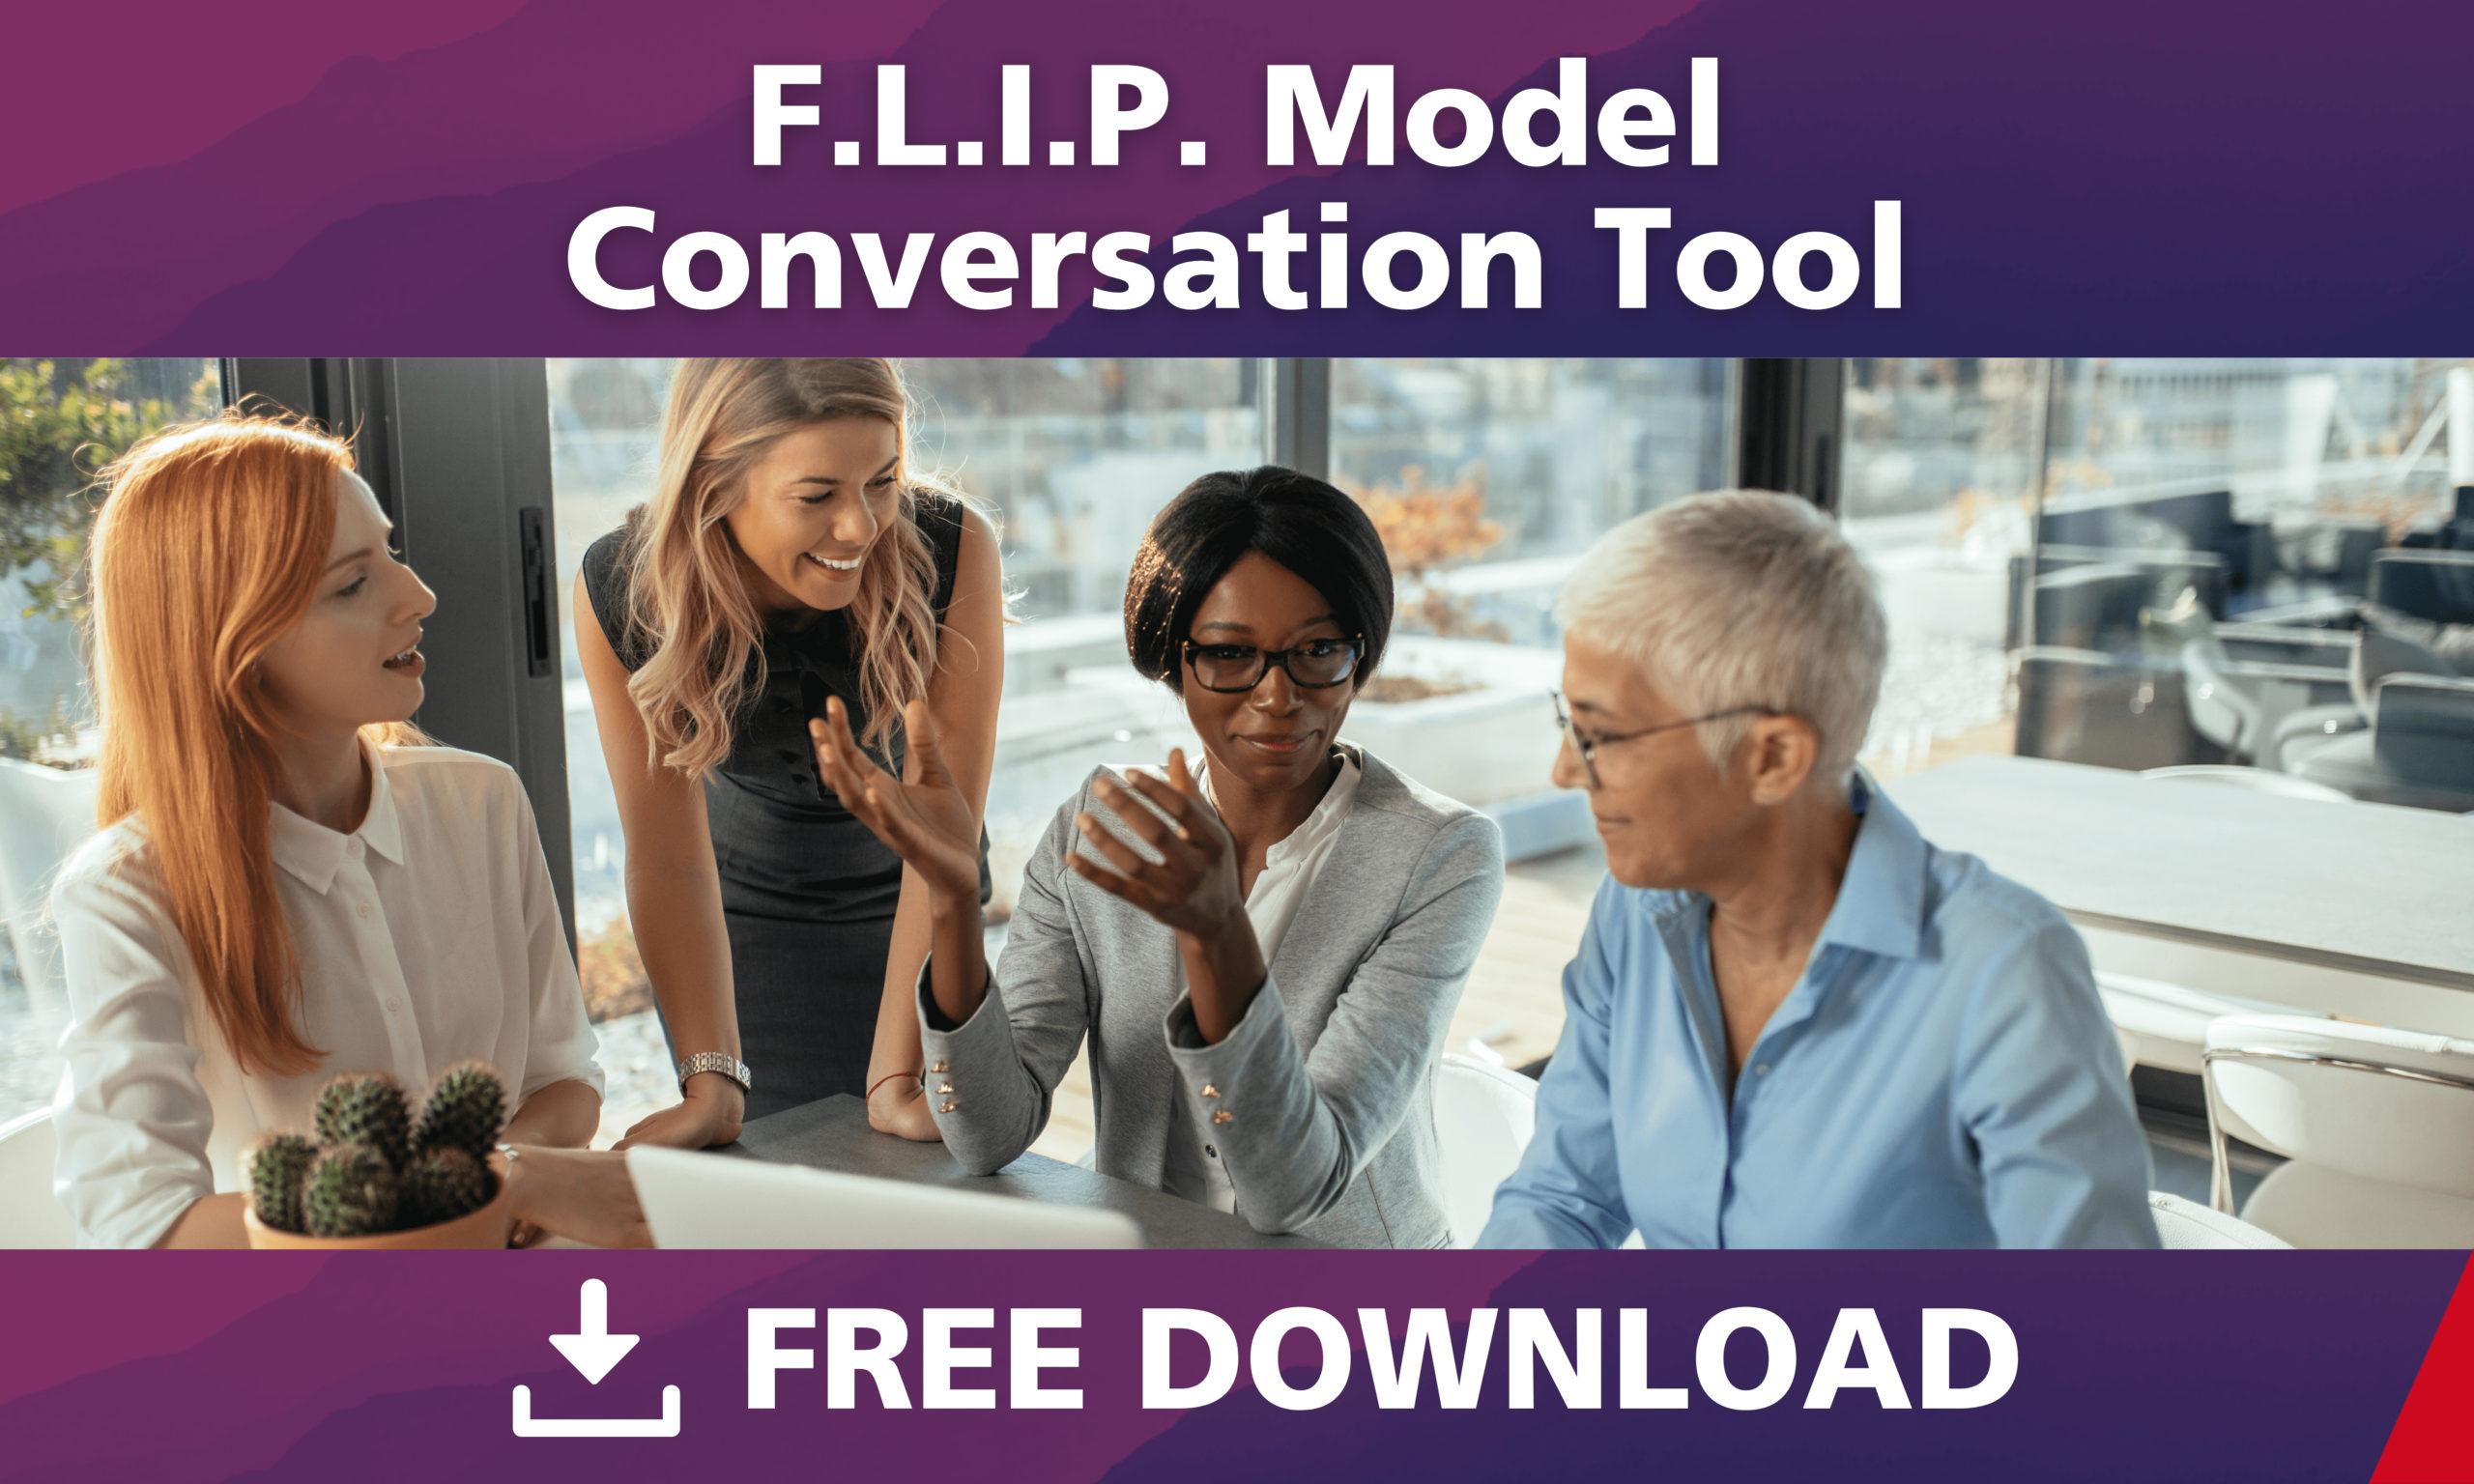 FLIP Model Conversational Tool